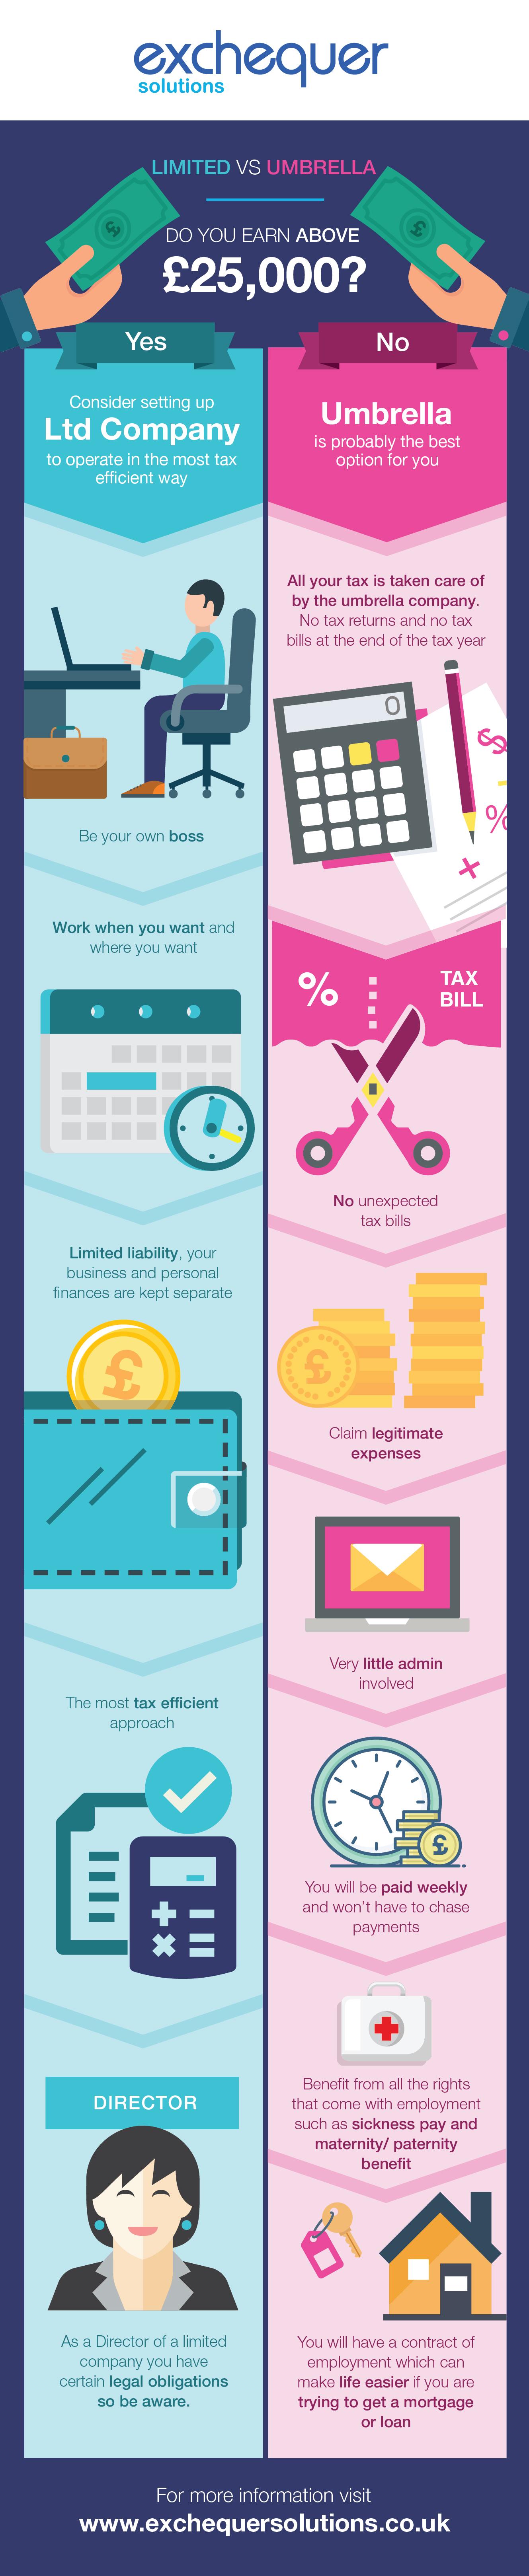 infographic_UmbrellavsLimited